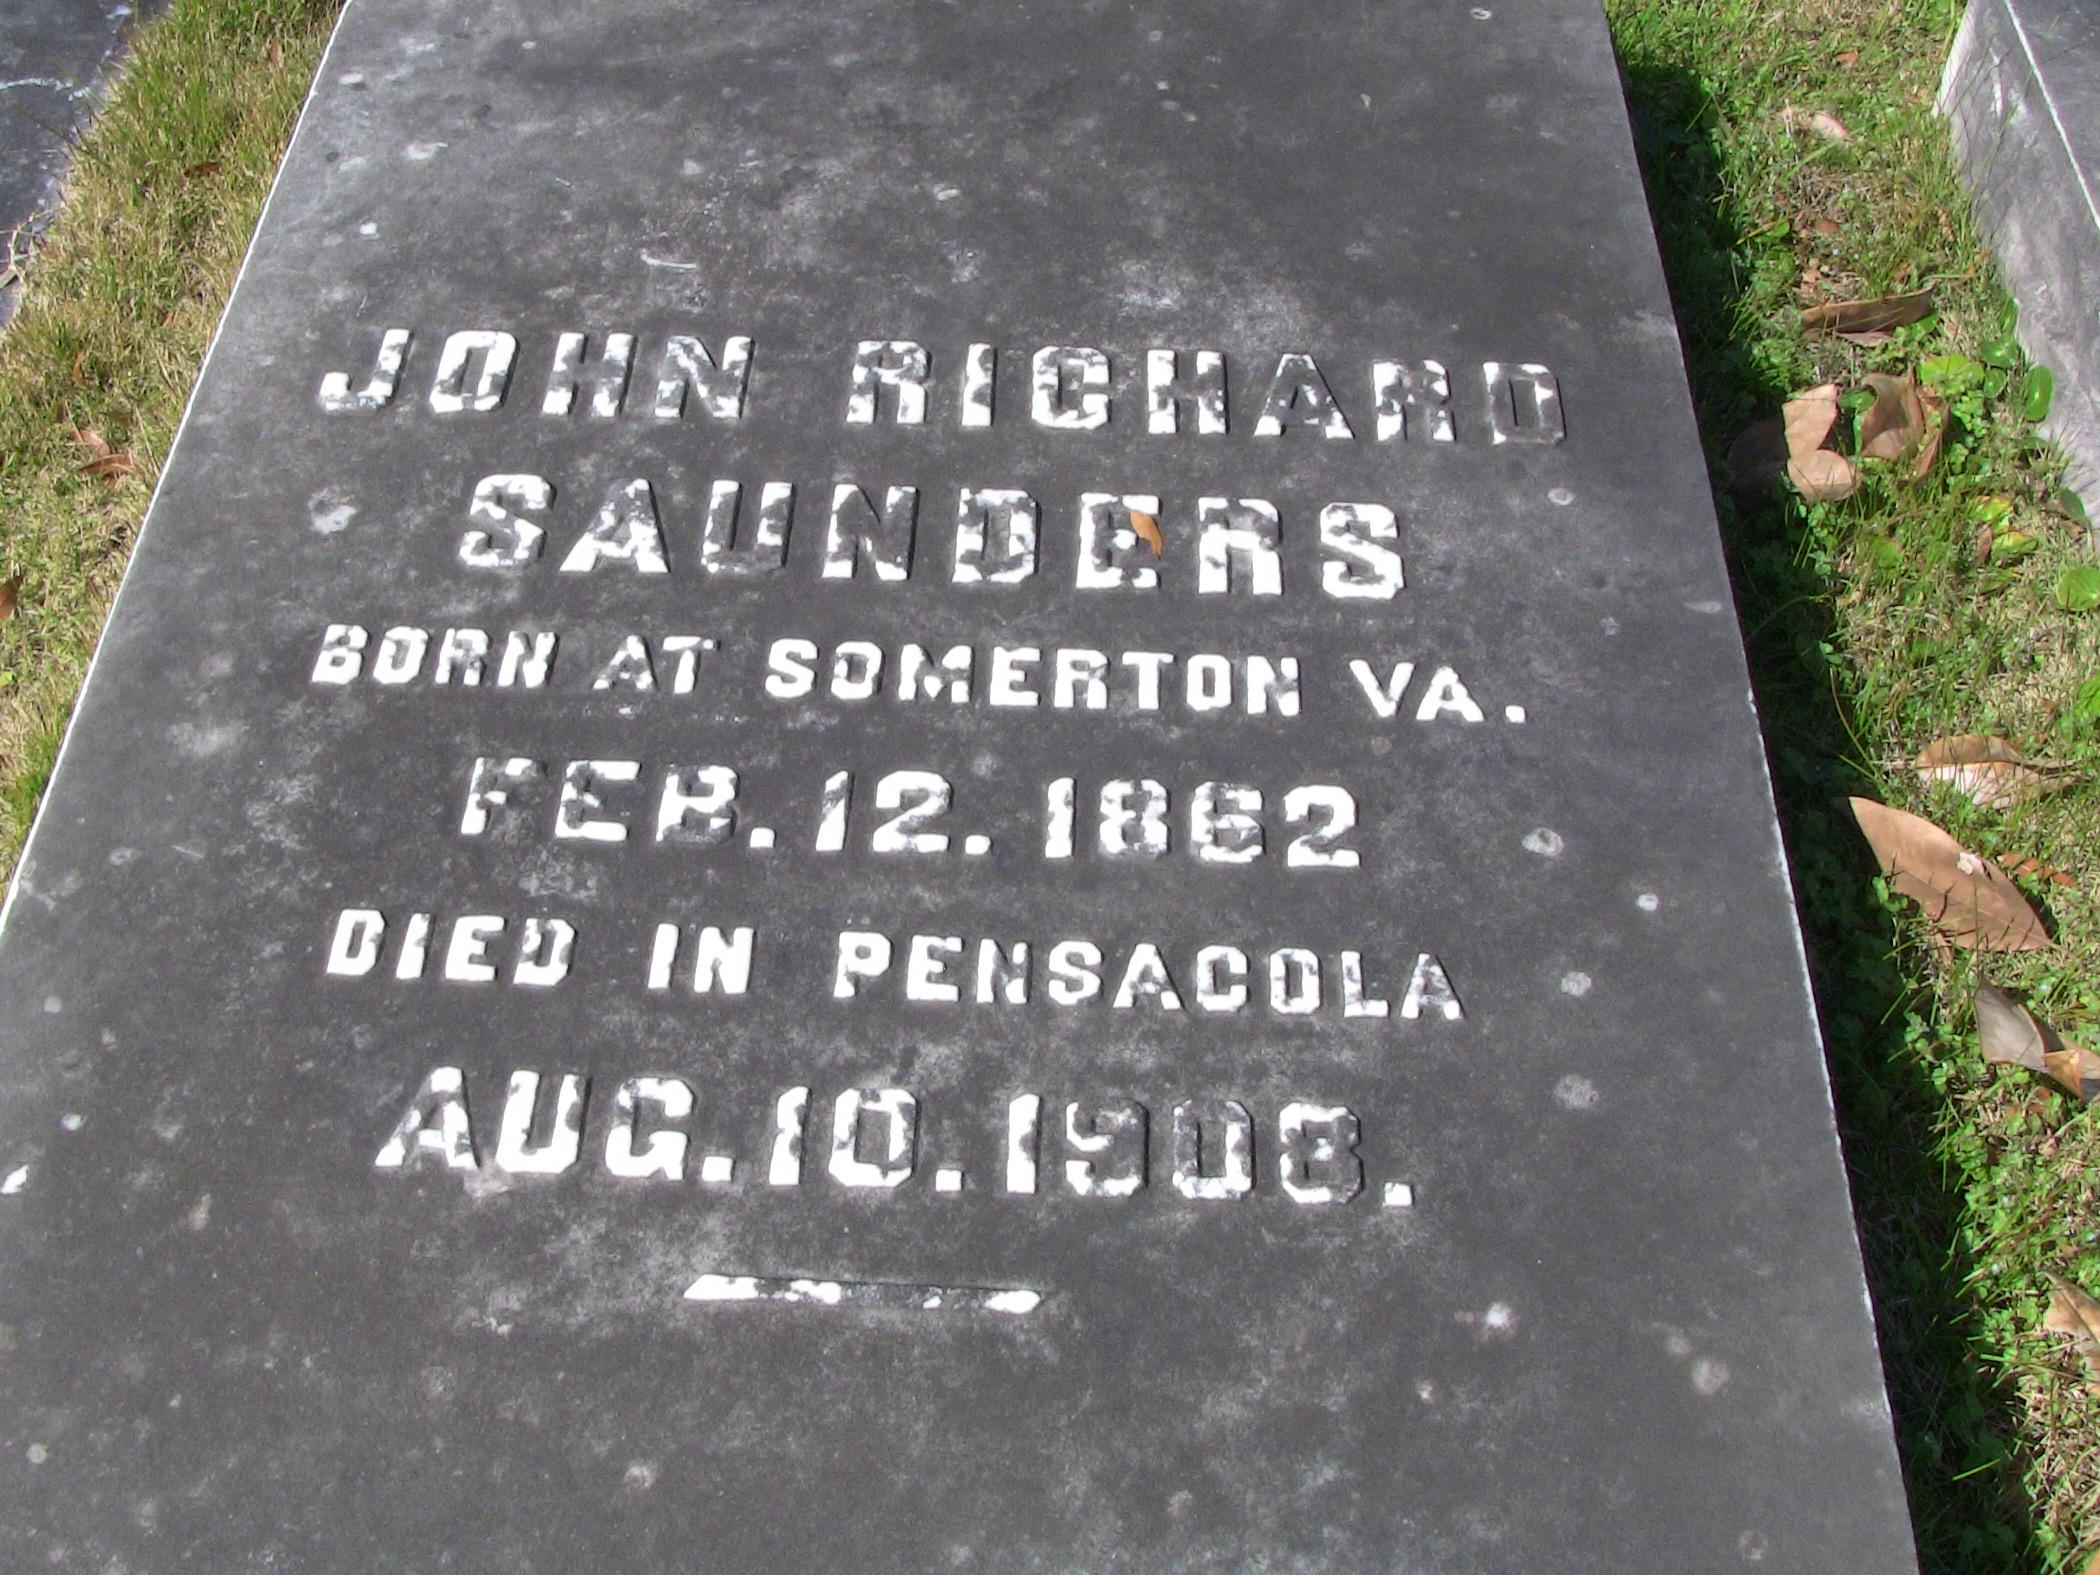 John Richard Saunders